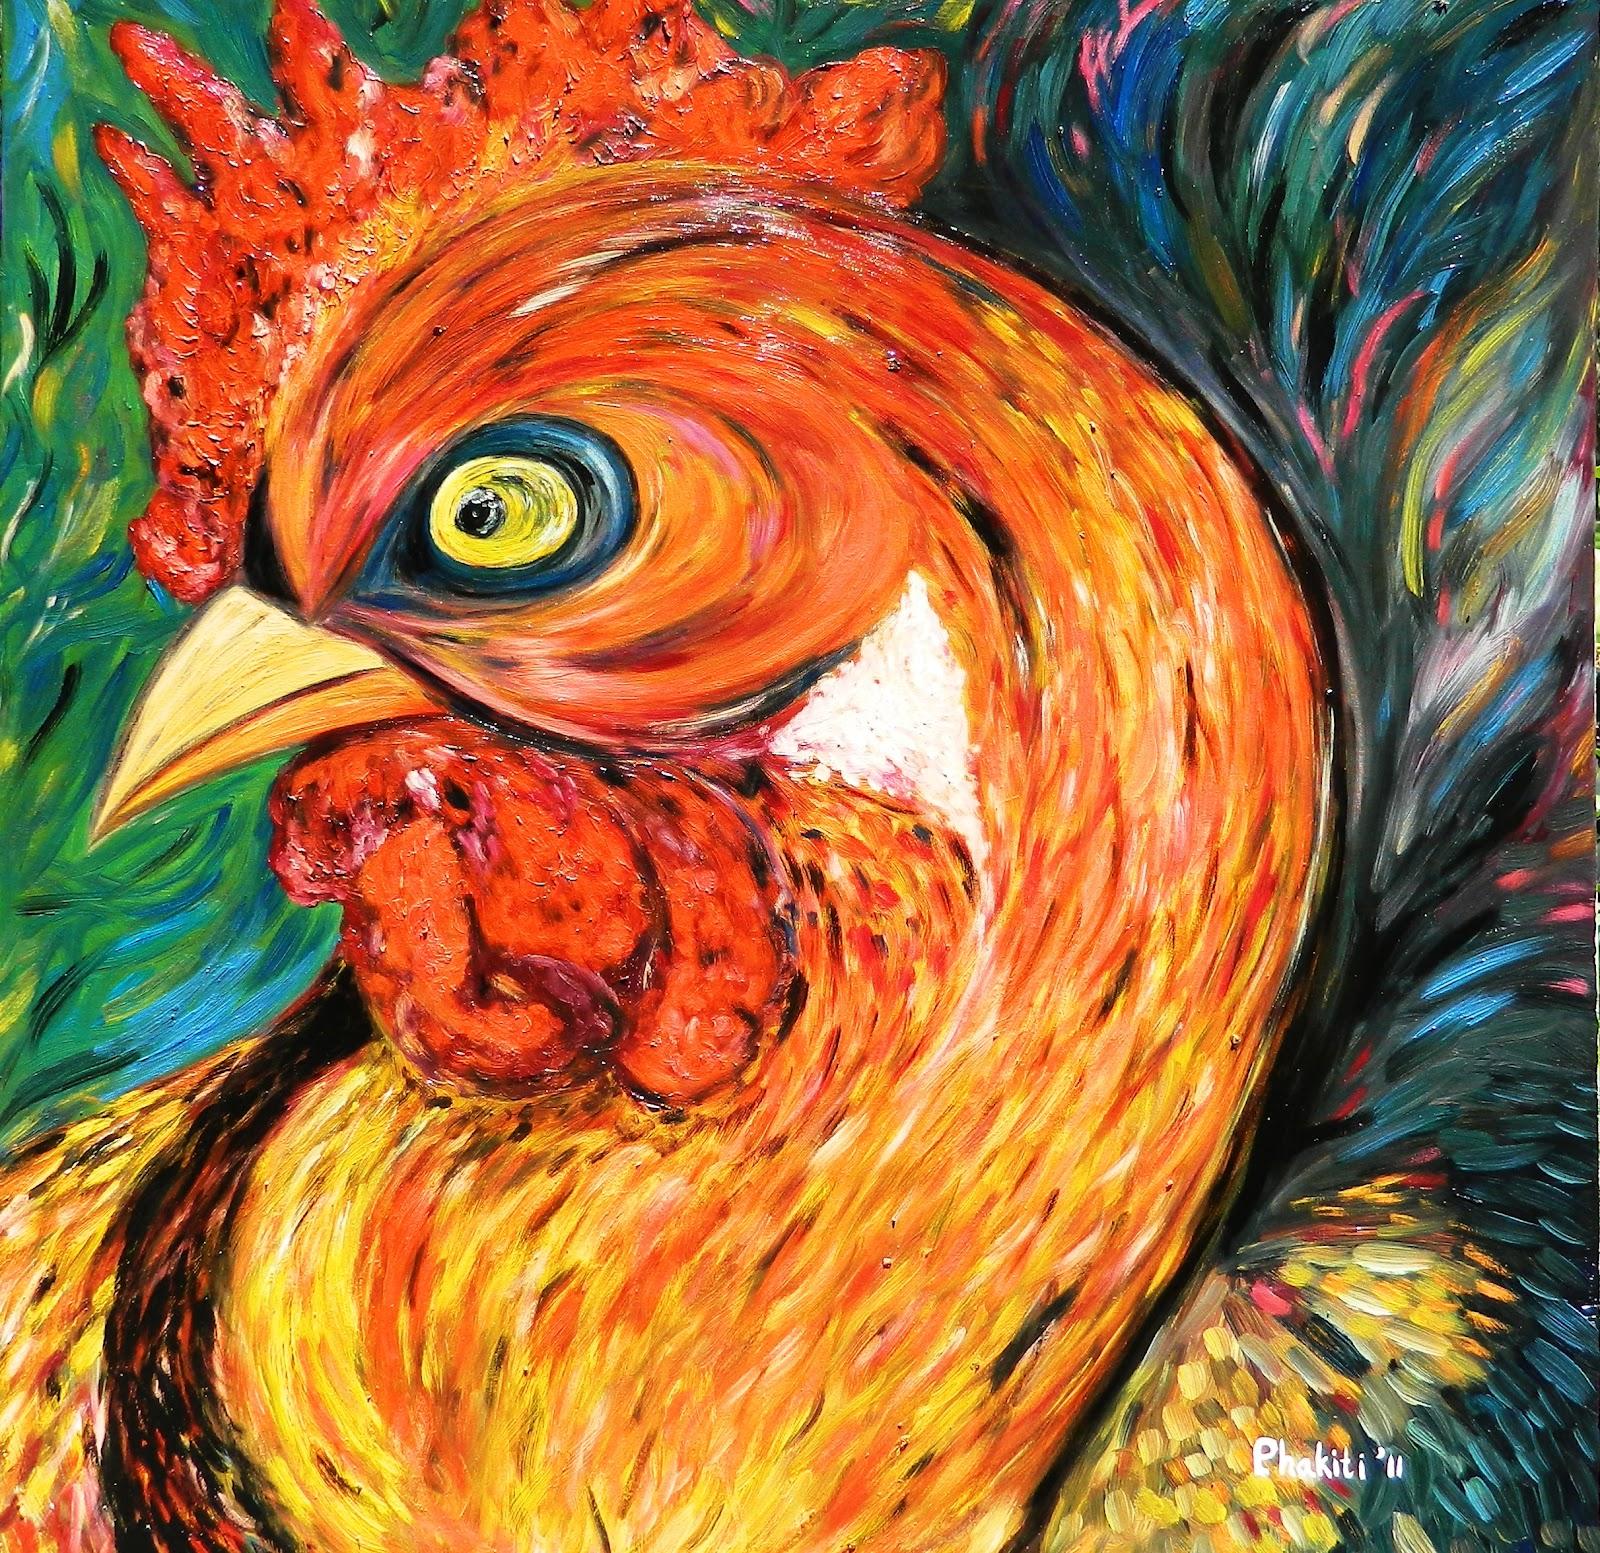 Artist Aek Phakiti: Aek Phakitis First Art Exhibition